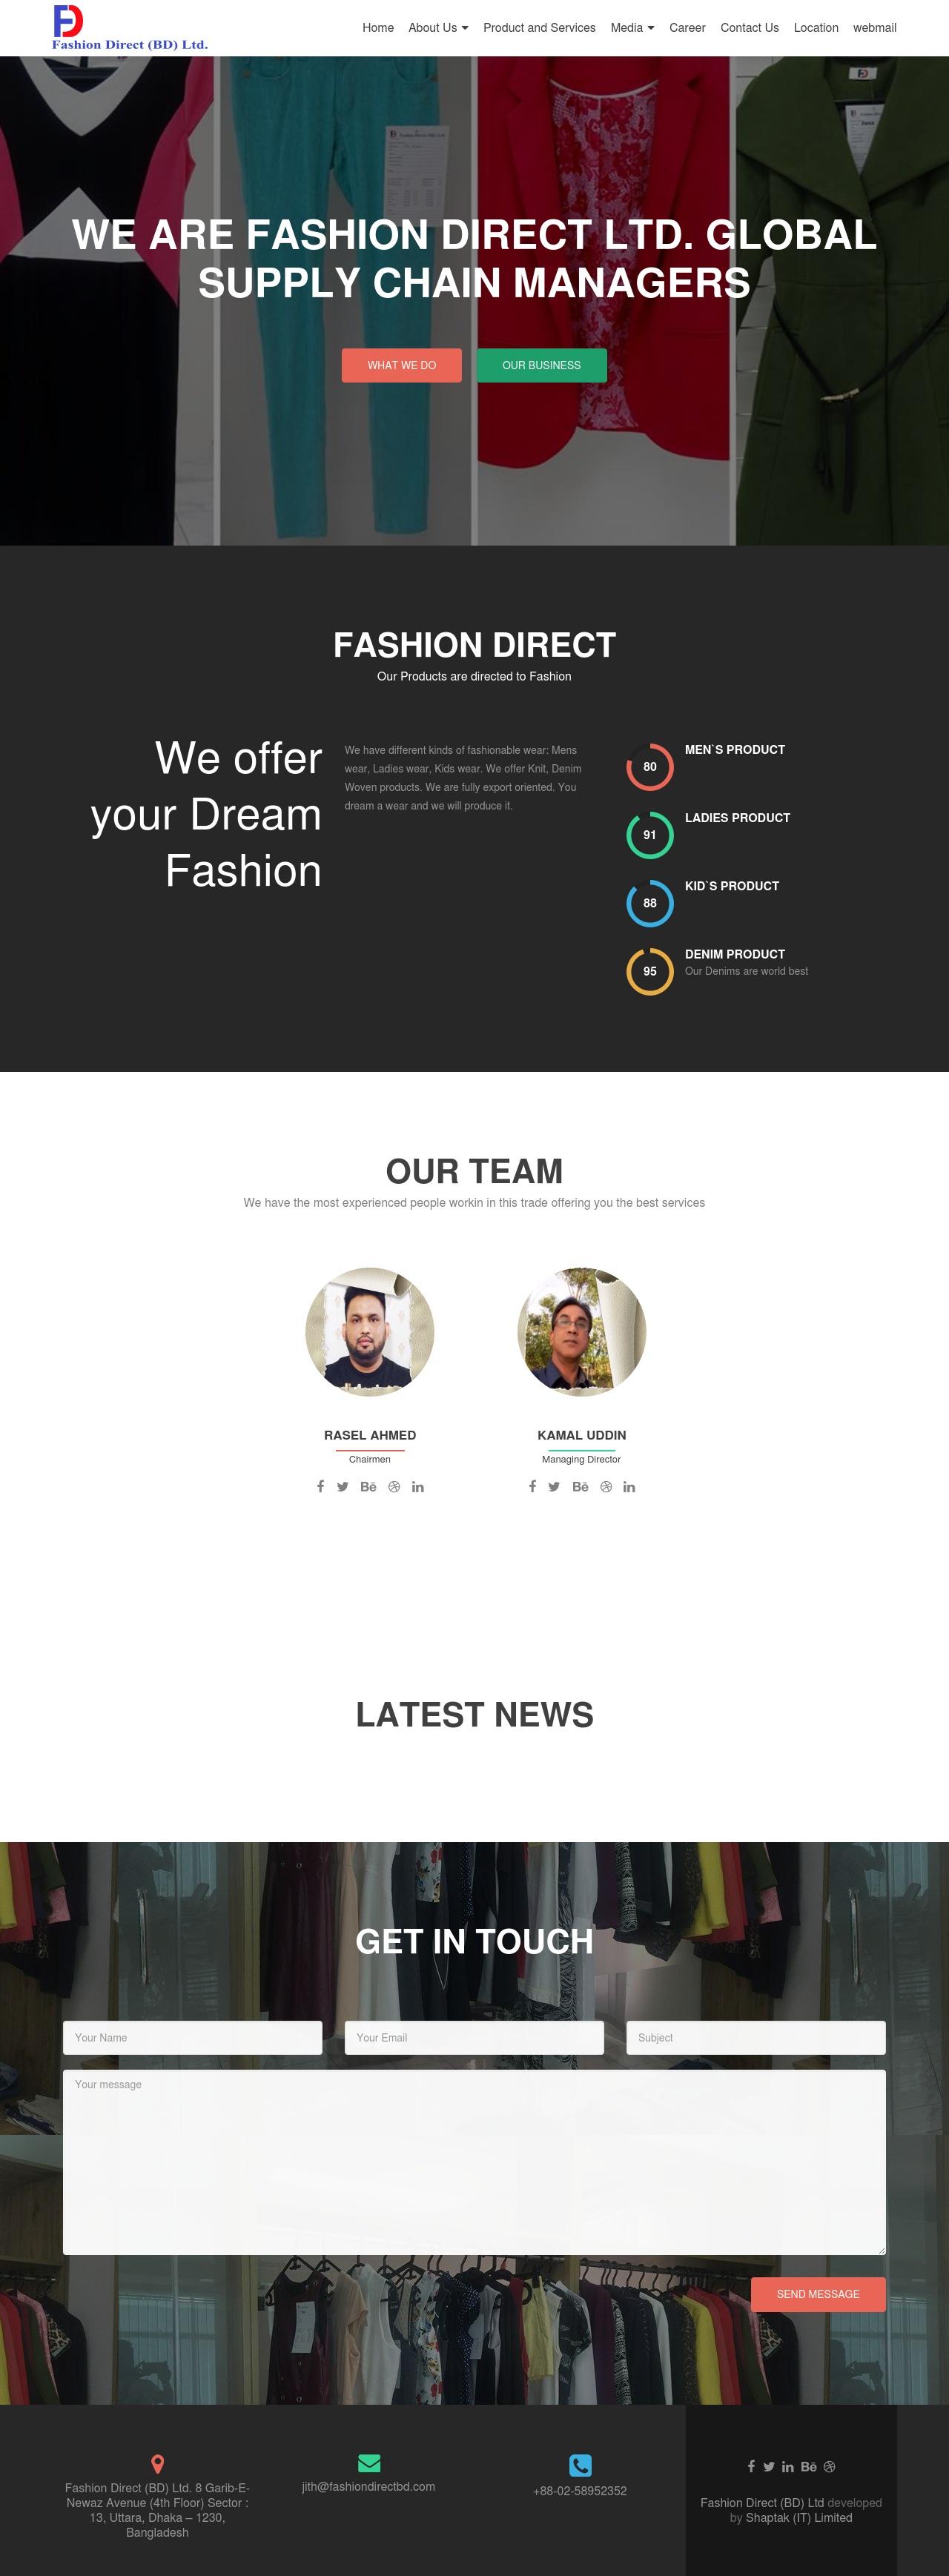 Fashion Direct Limited